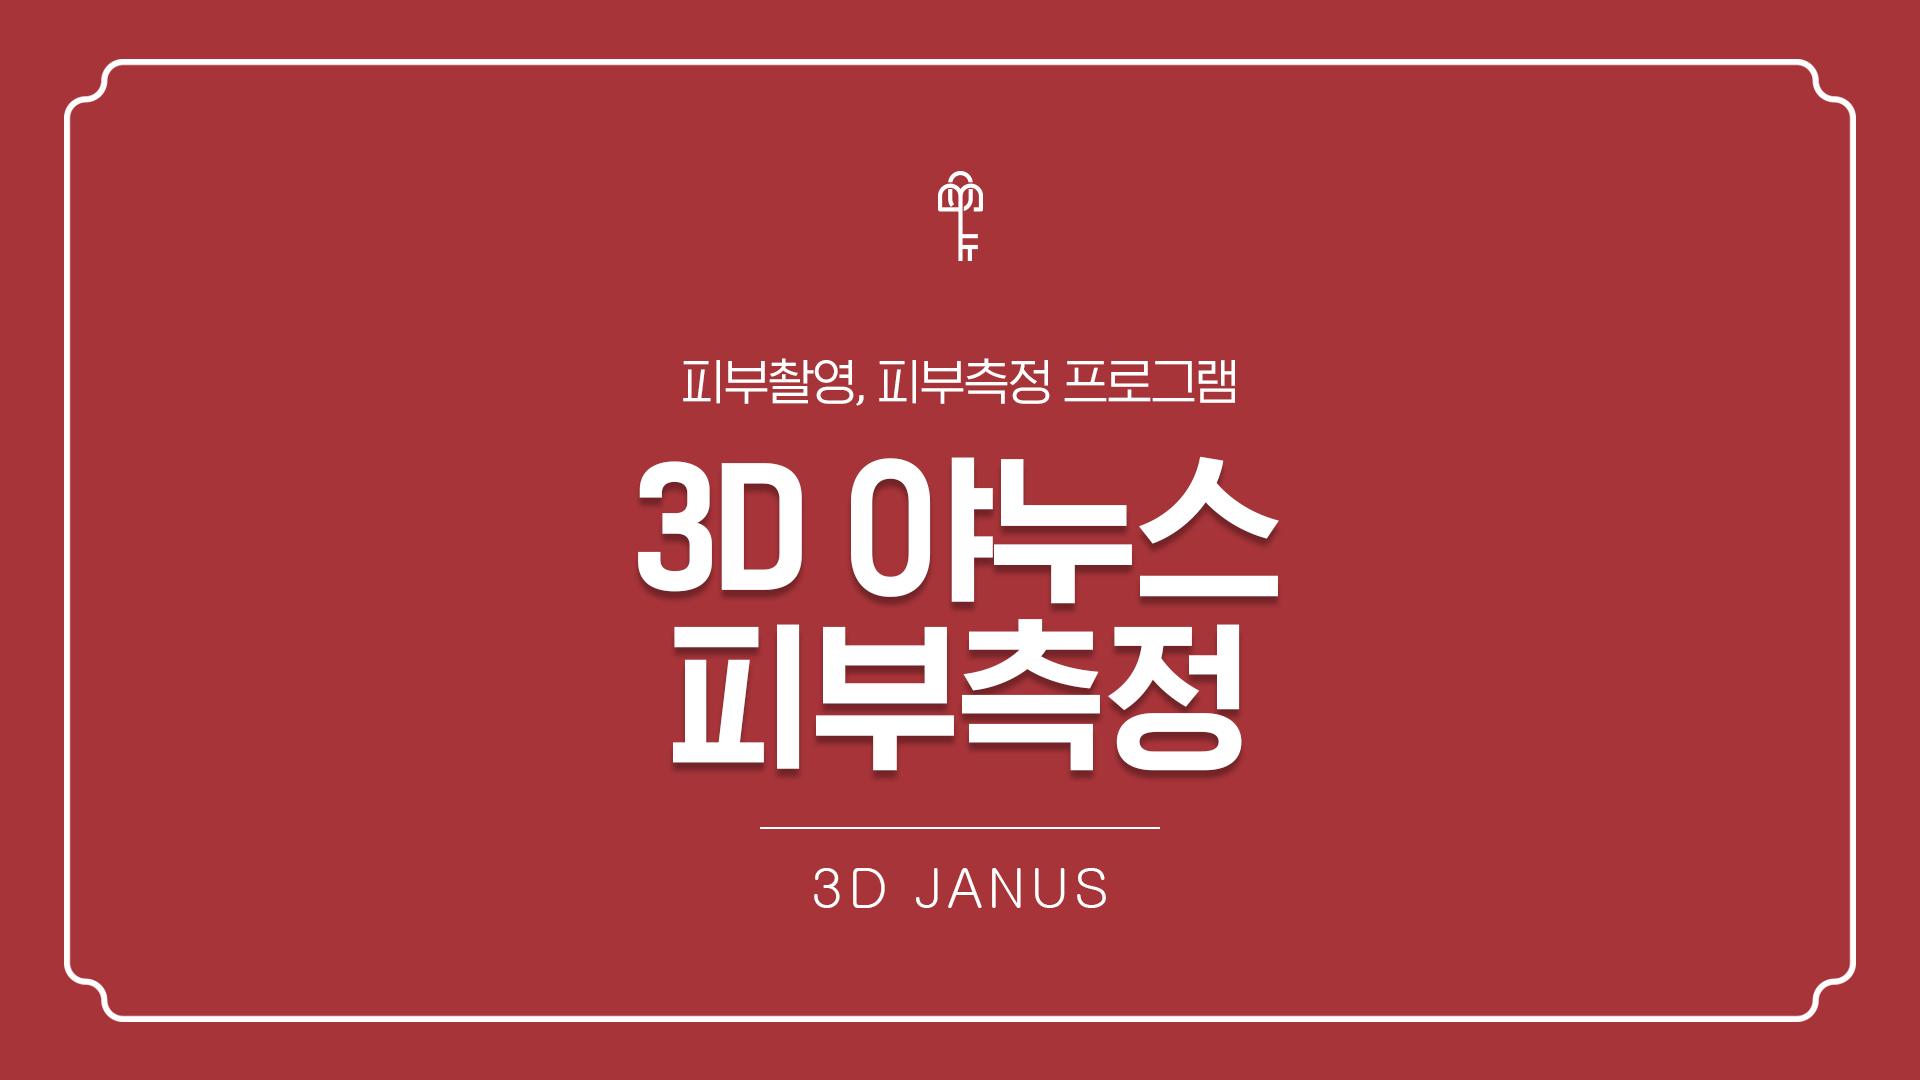 3D 야누스 피부측정 1000원